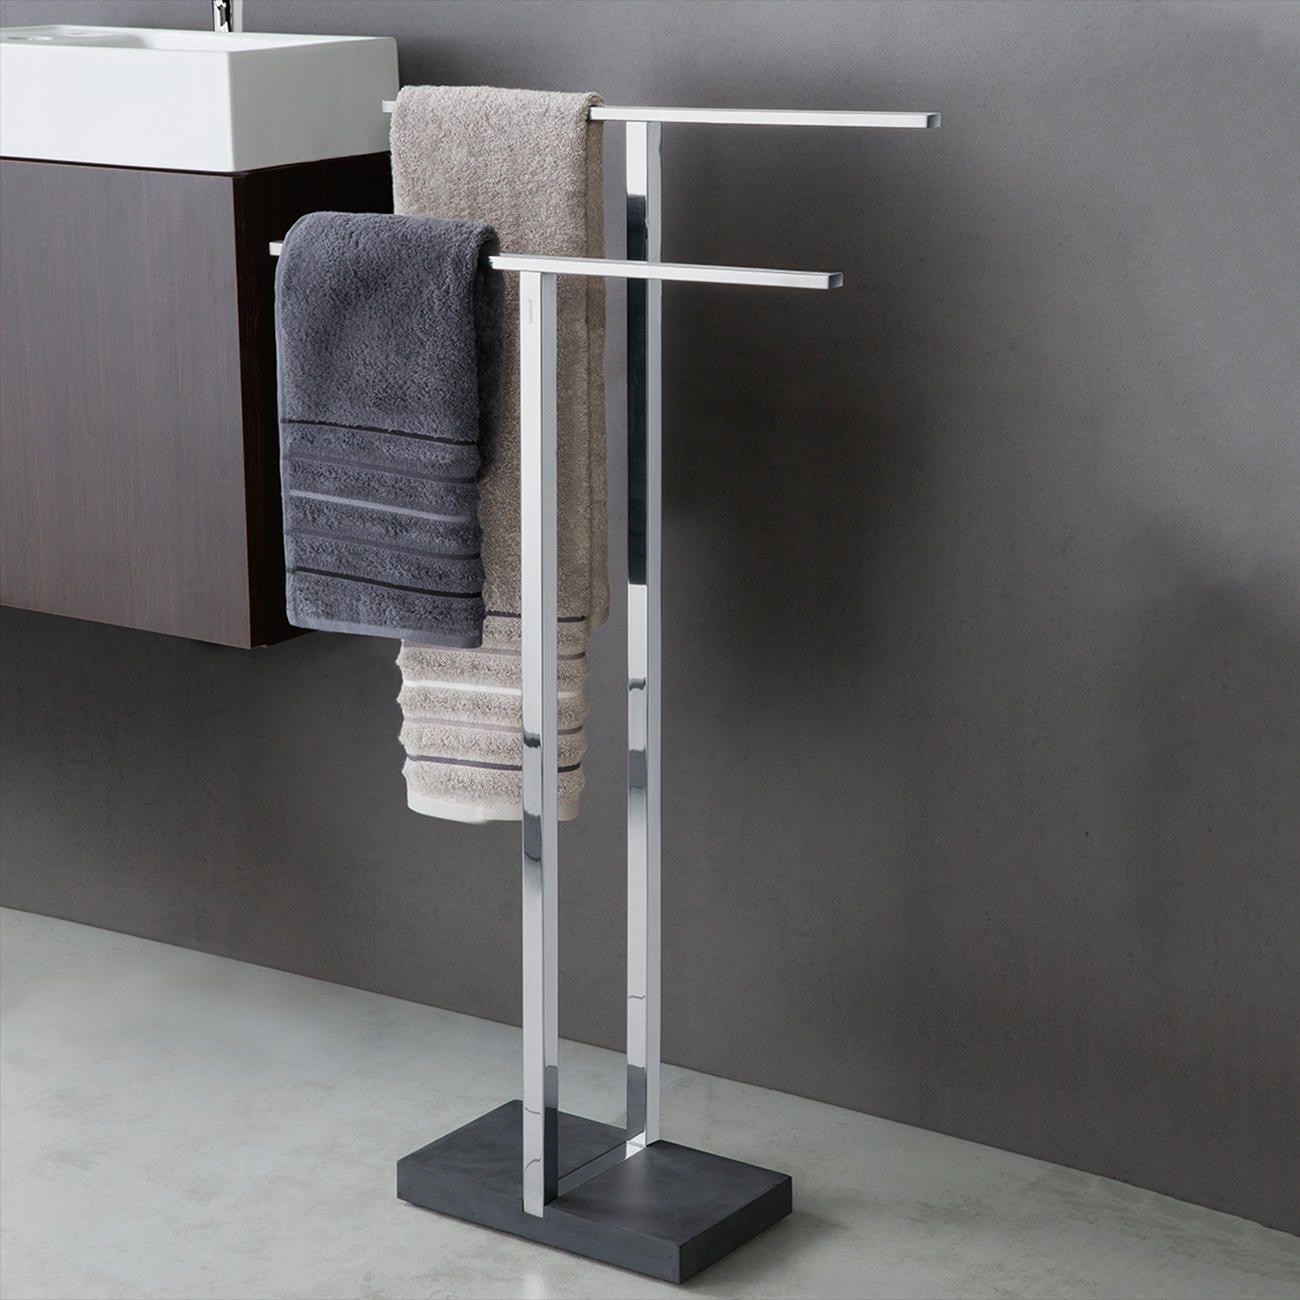 Polystone wc-butler of Polystone handdoekenrek - Bekroond design ...